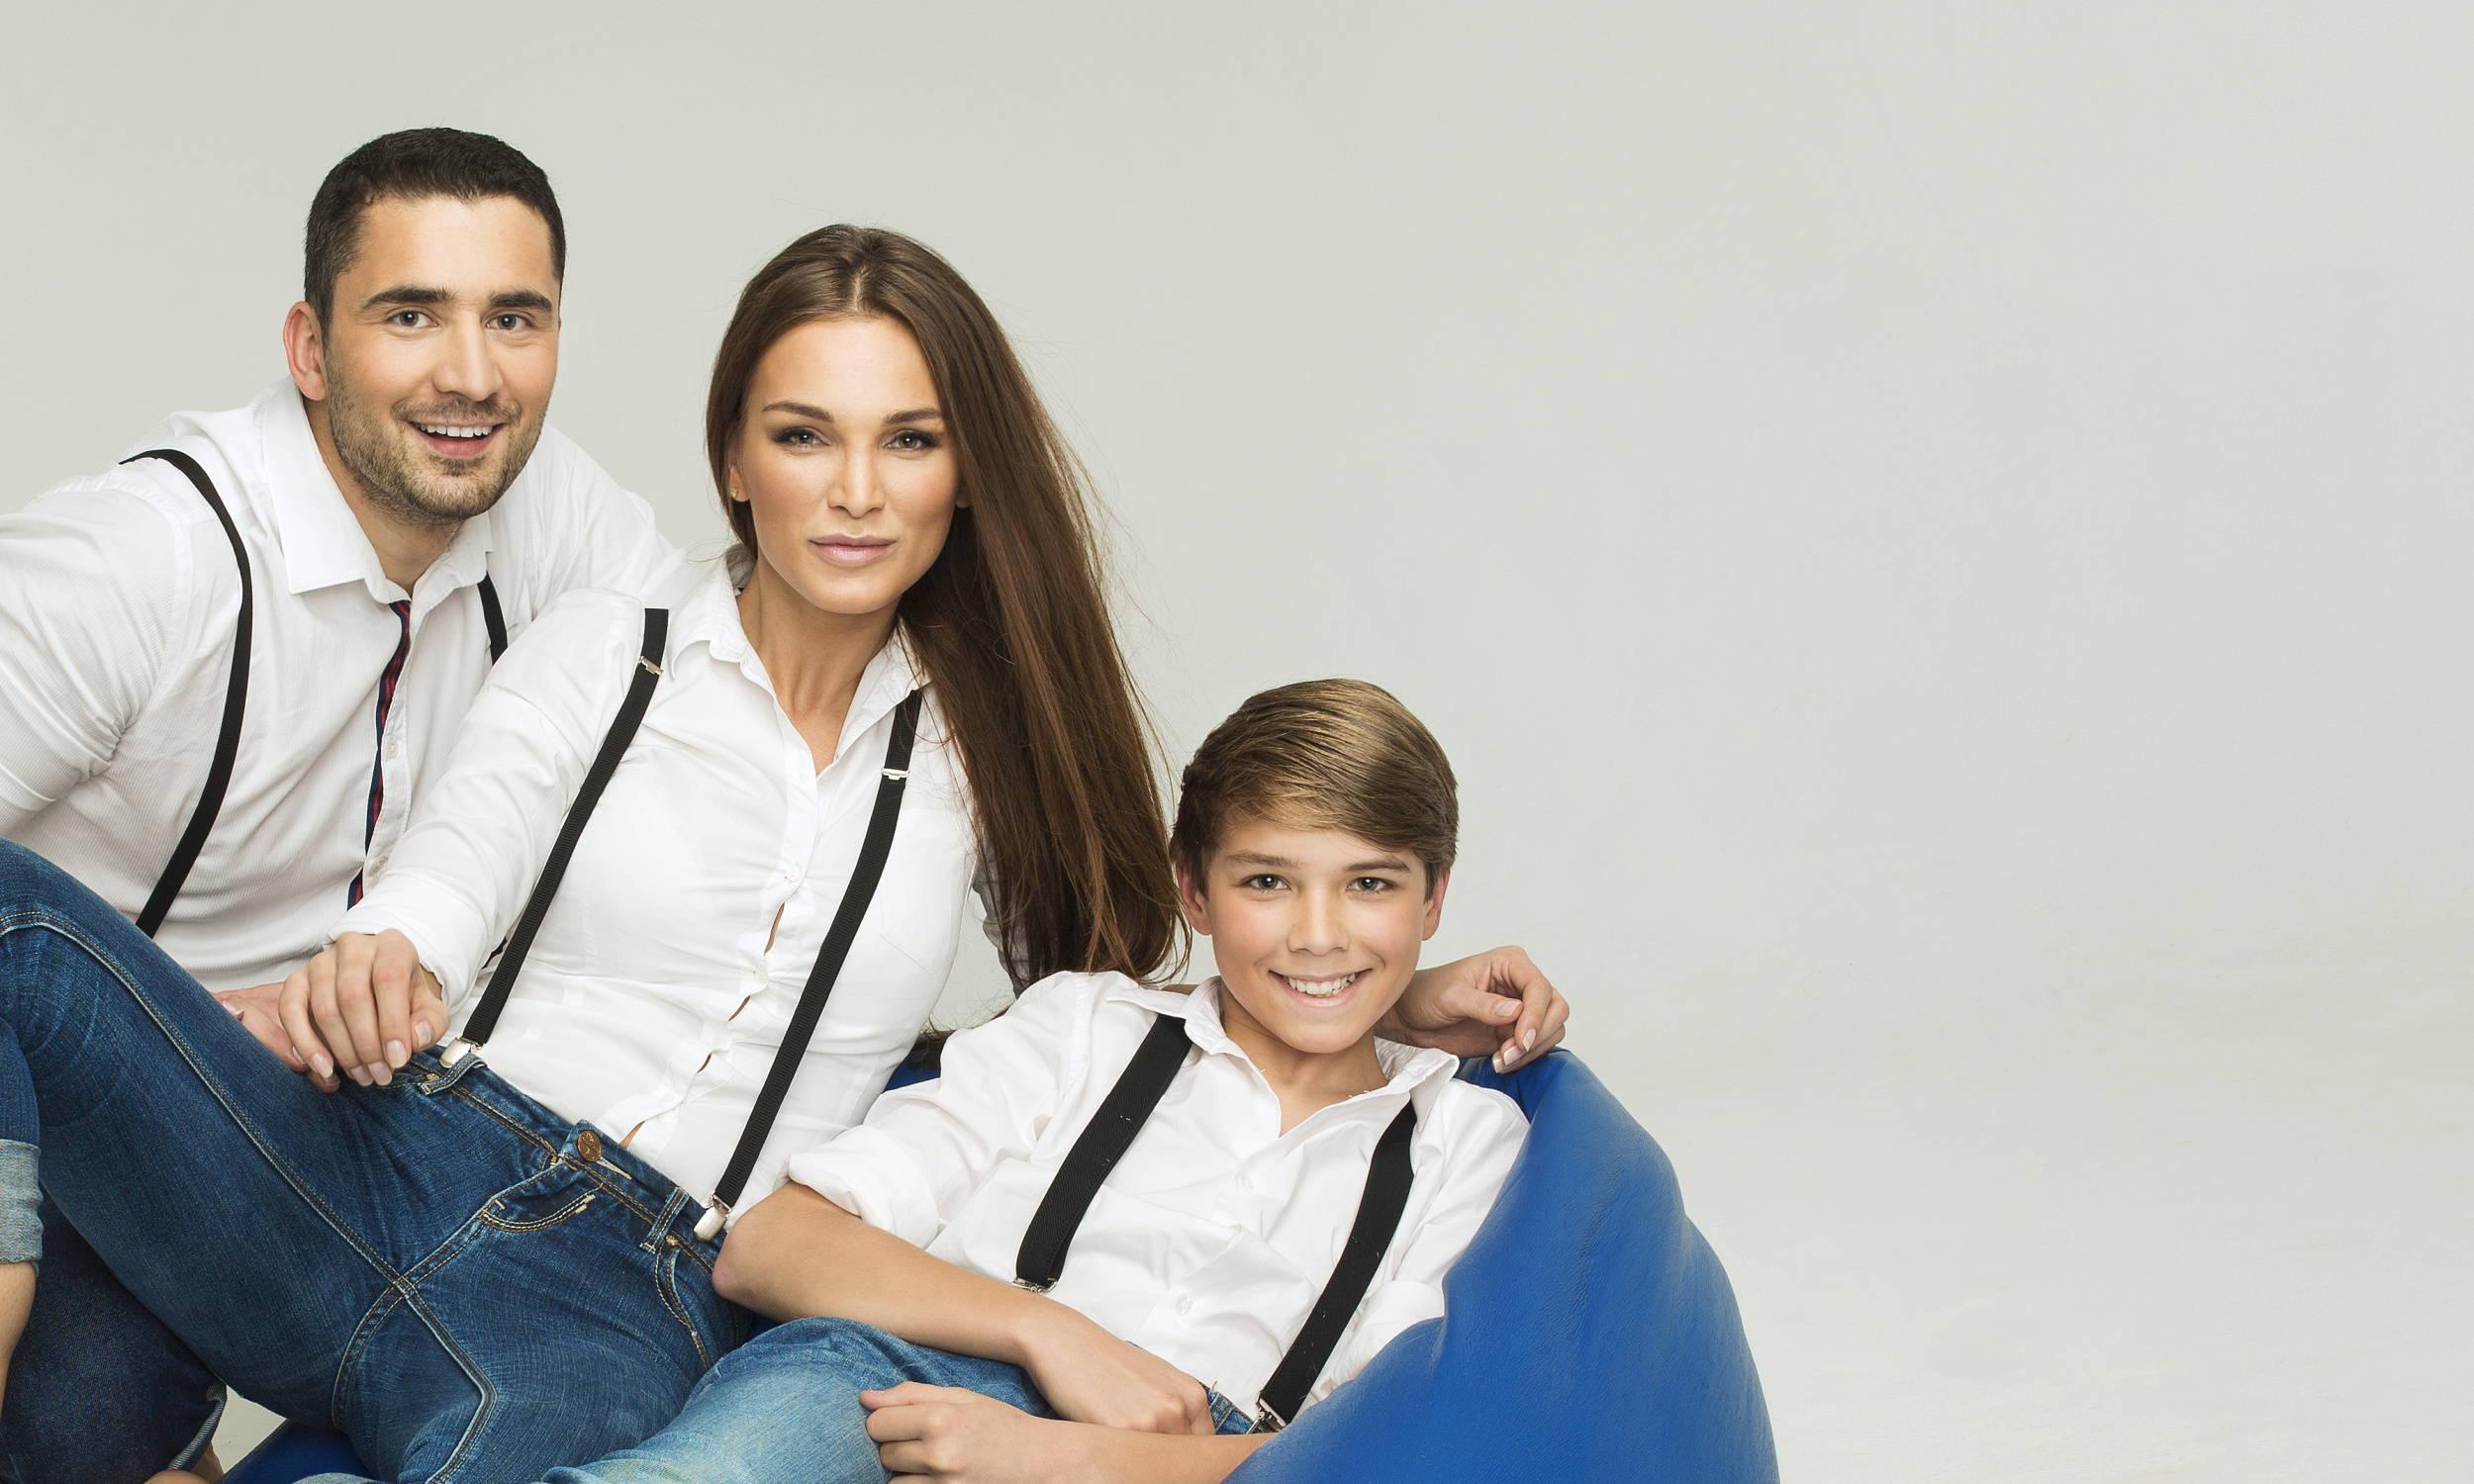 Family Wearing Suspenders